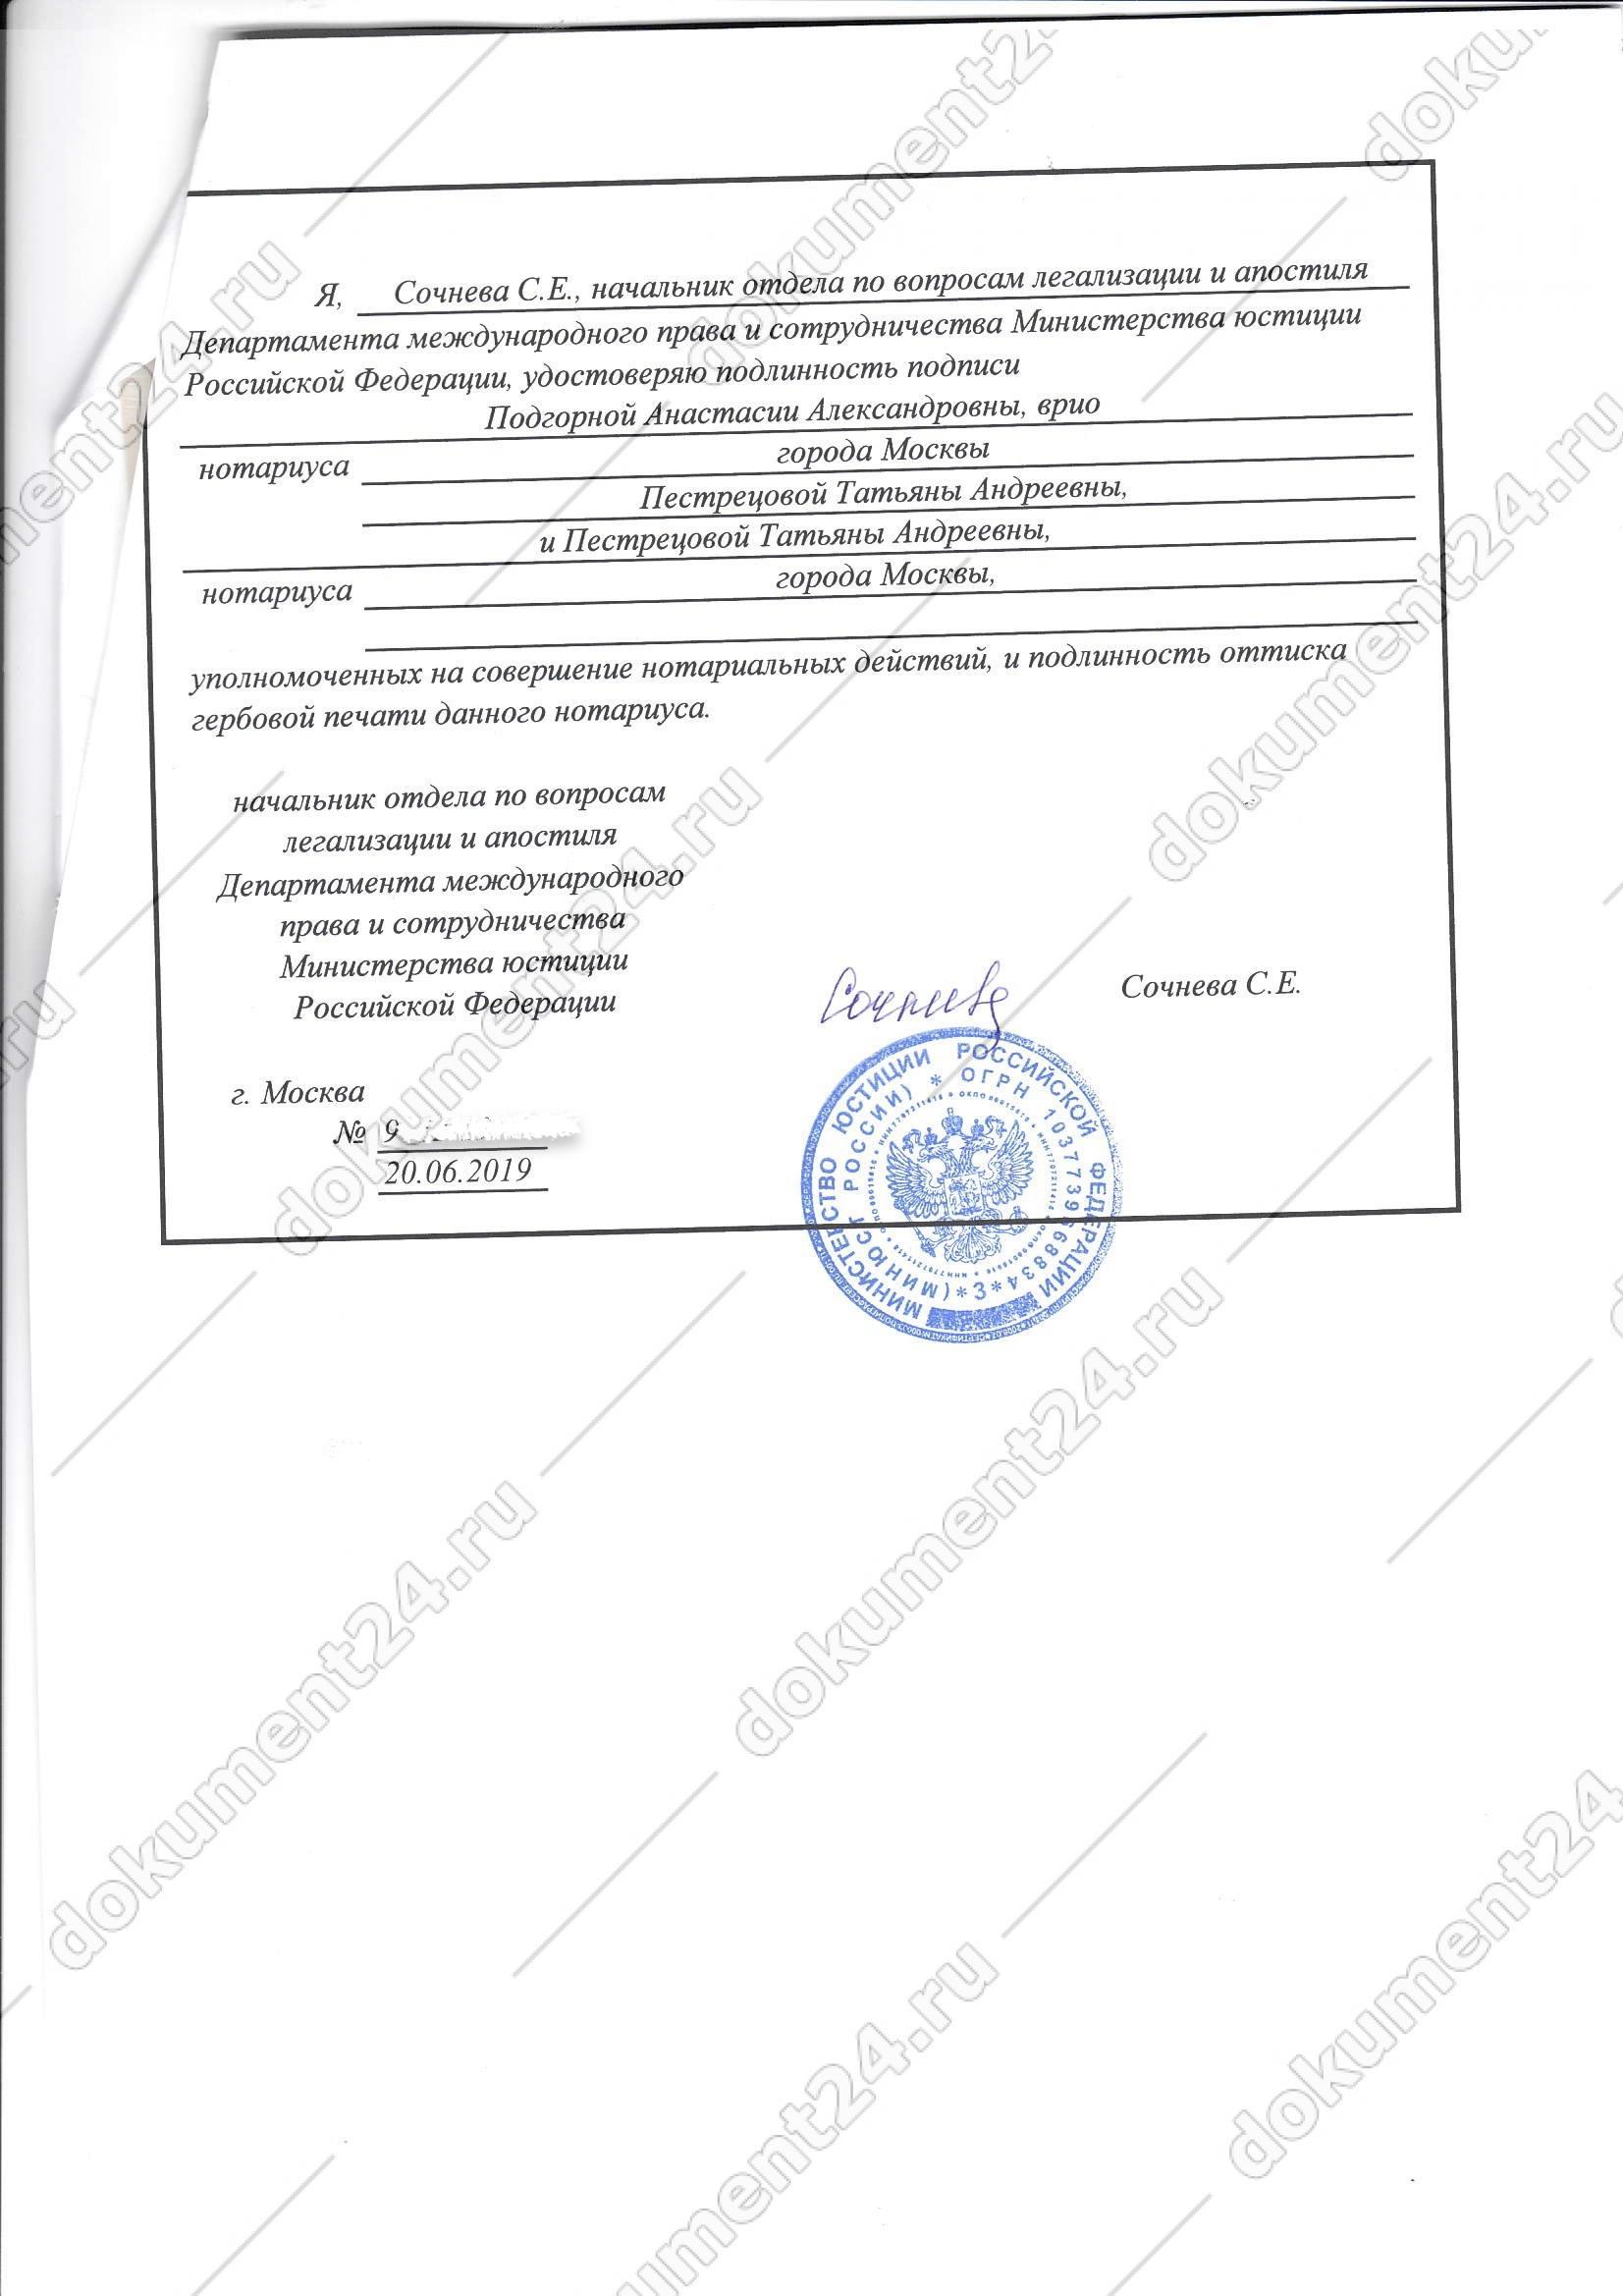 soglasie-konsulskaya-legalizatsiya-kitai